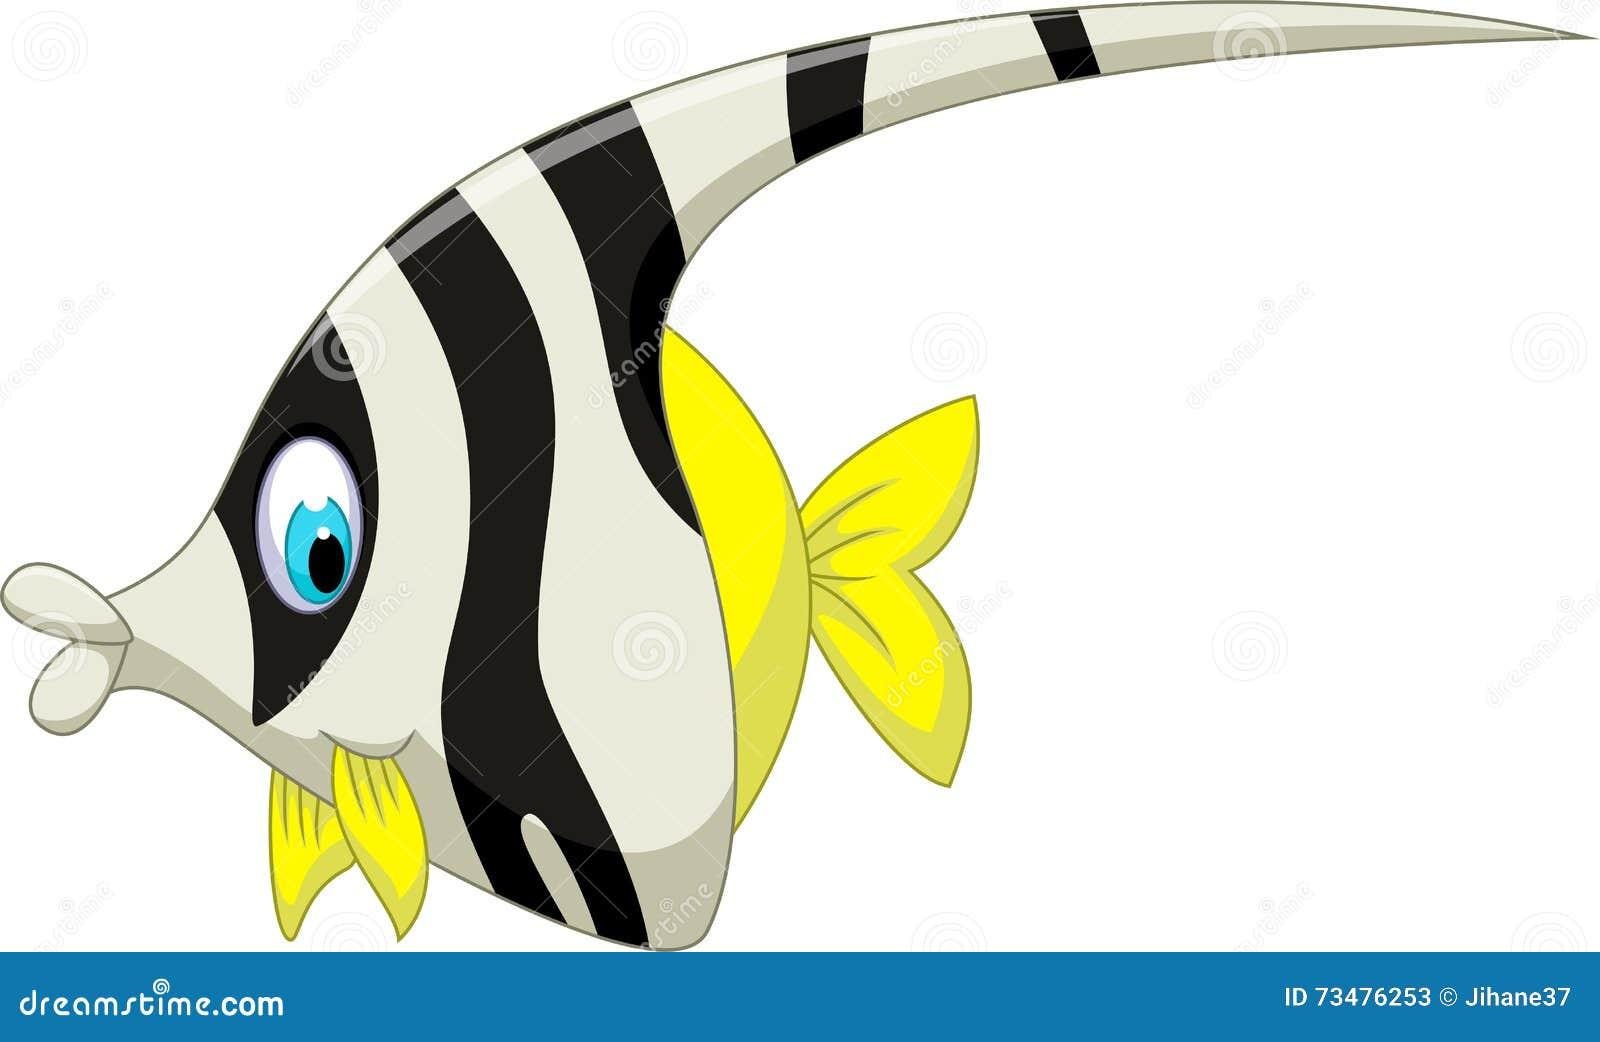 Uncategorized Cartoon Angel Fish funny black and white angel fish cartoon stock illustration royalty free download cartoon